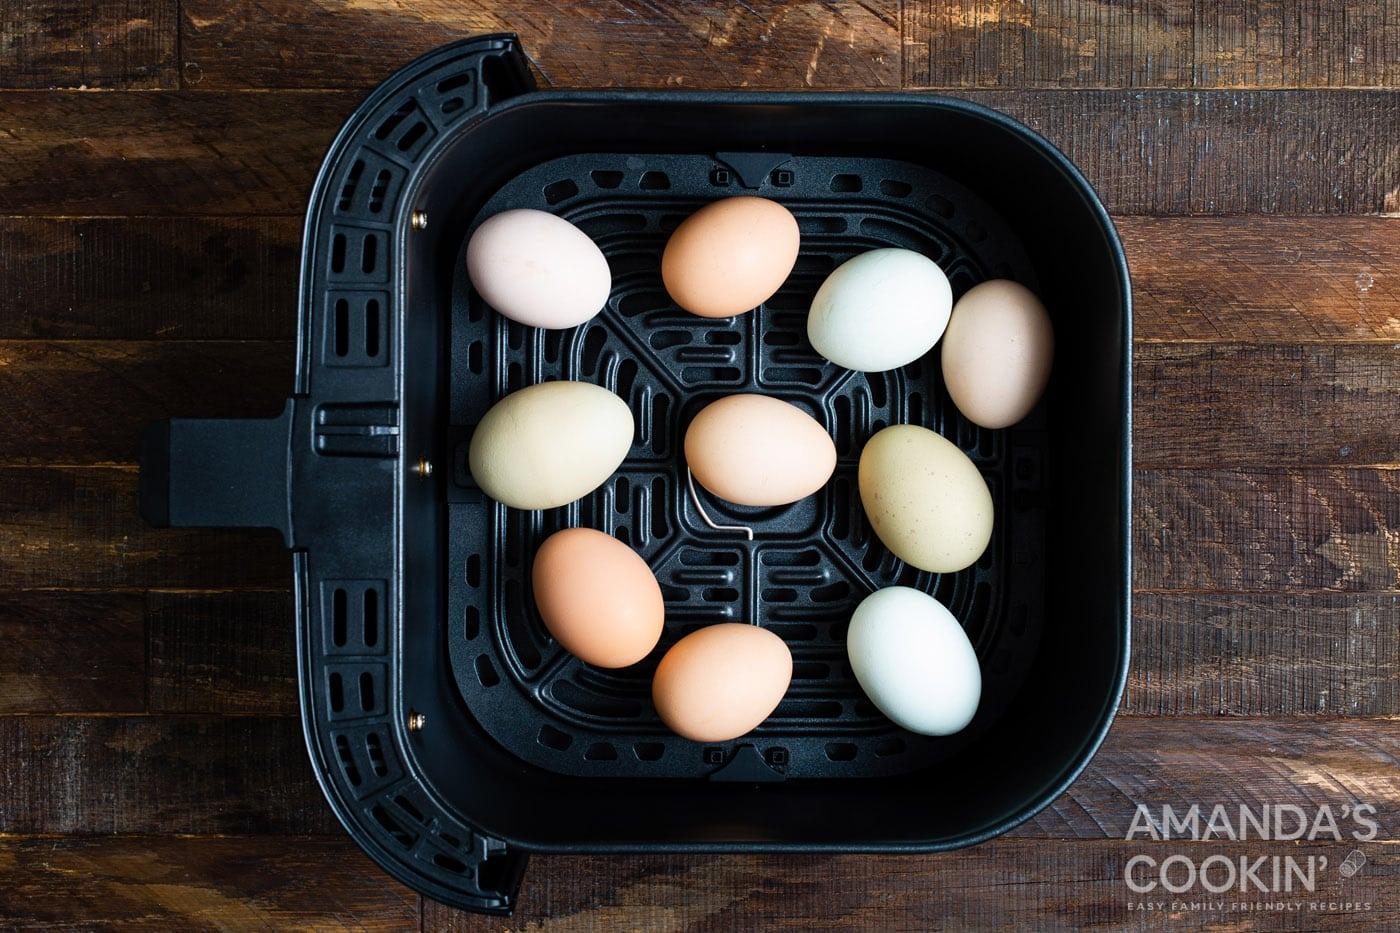 Eggs on air fryer basket